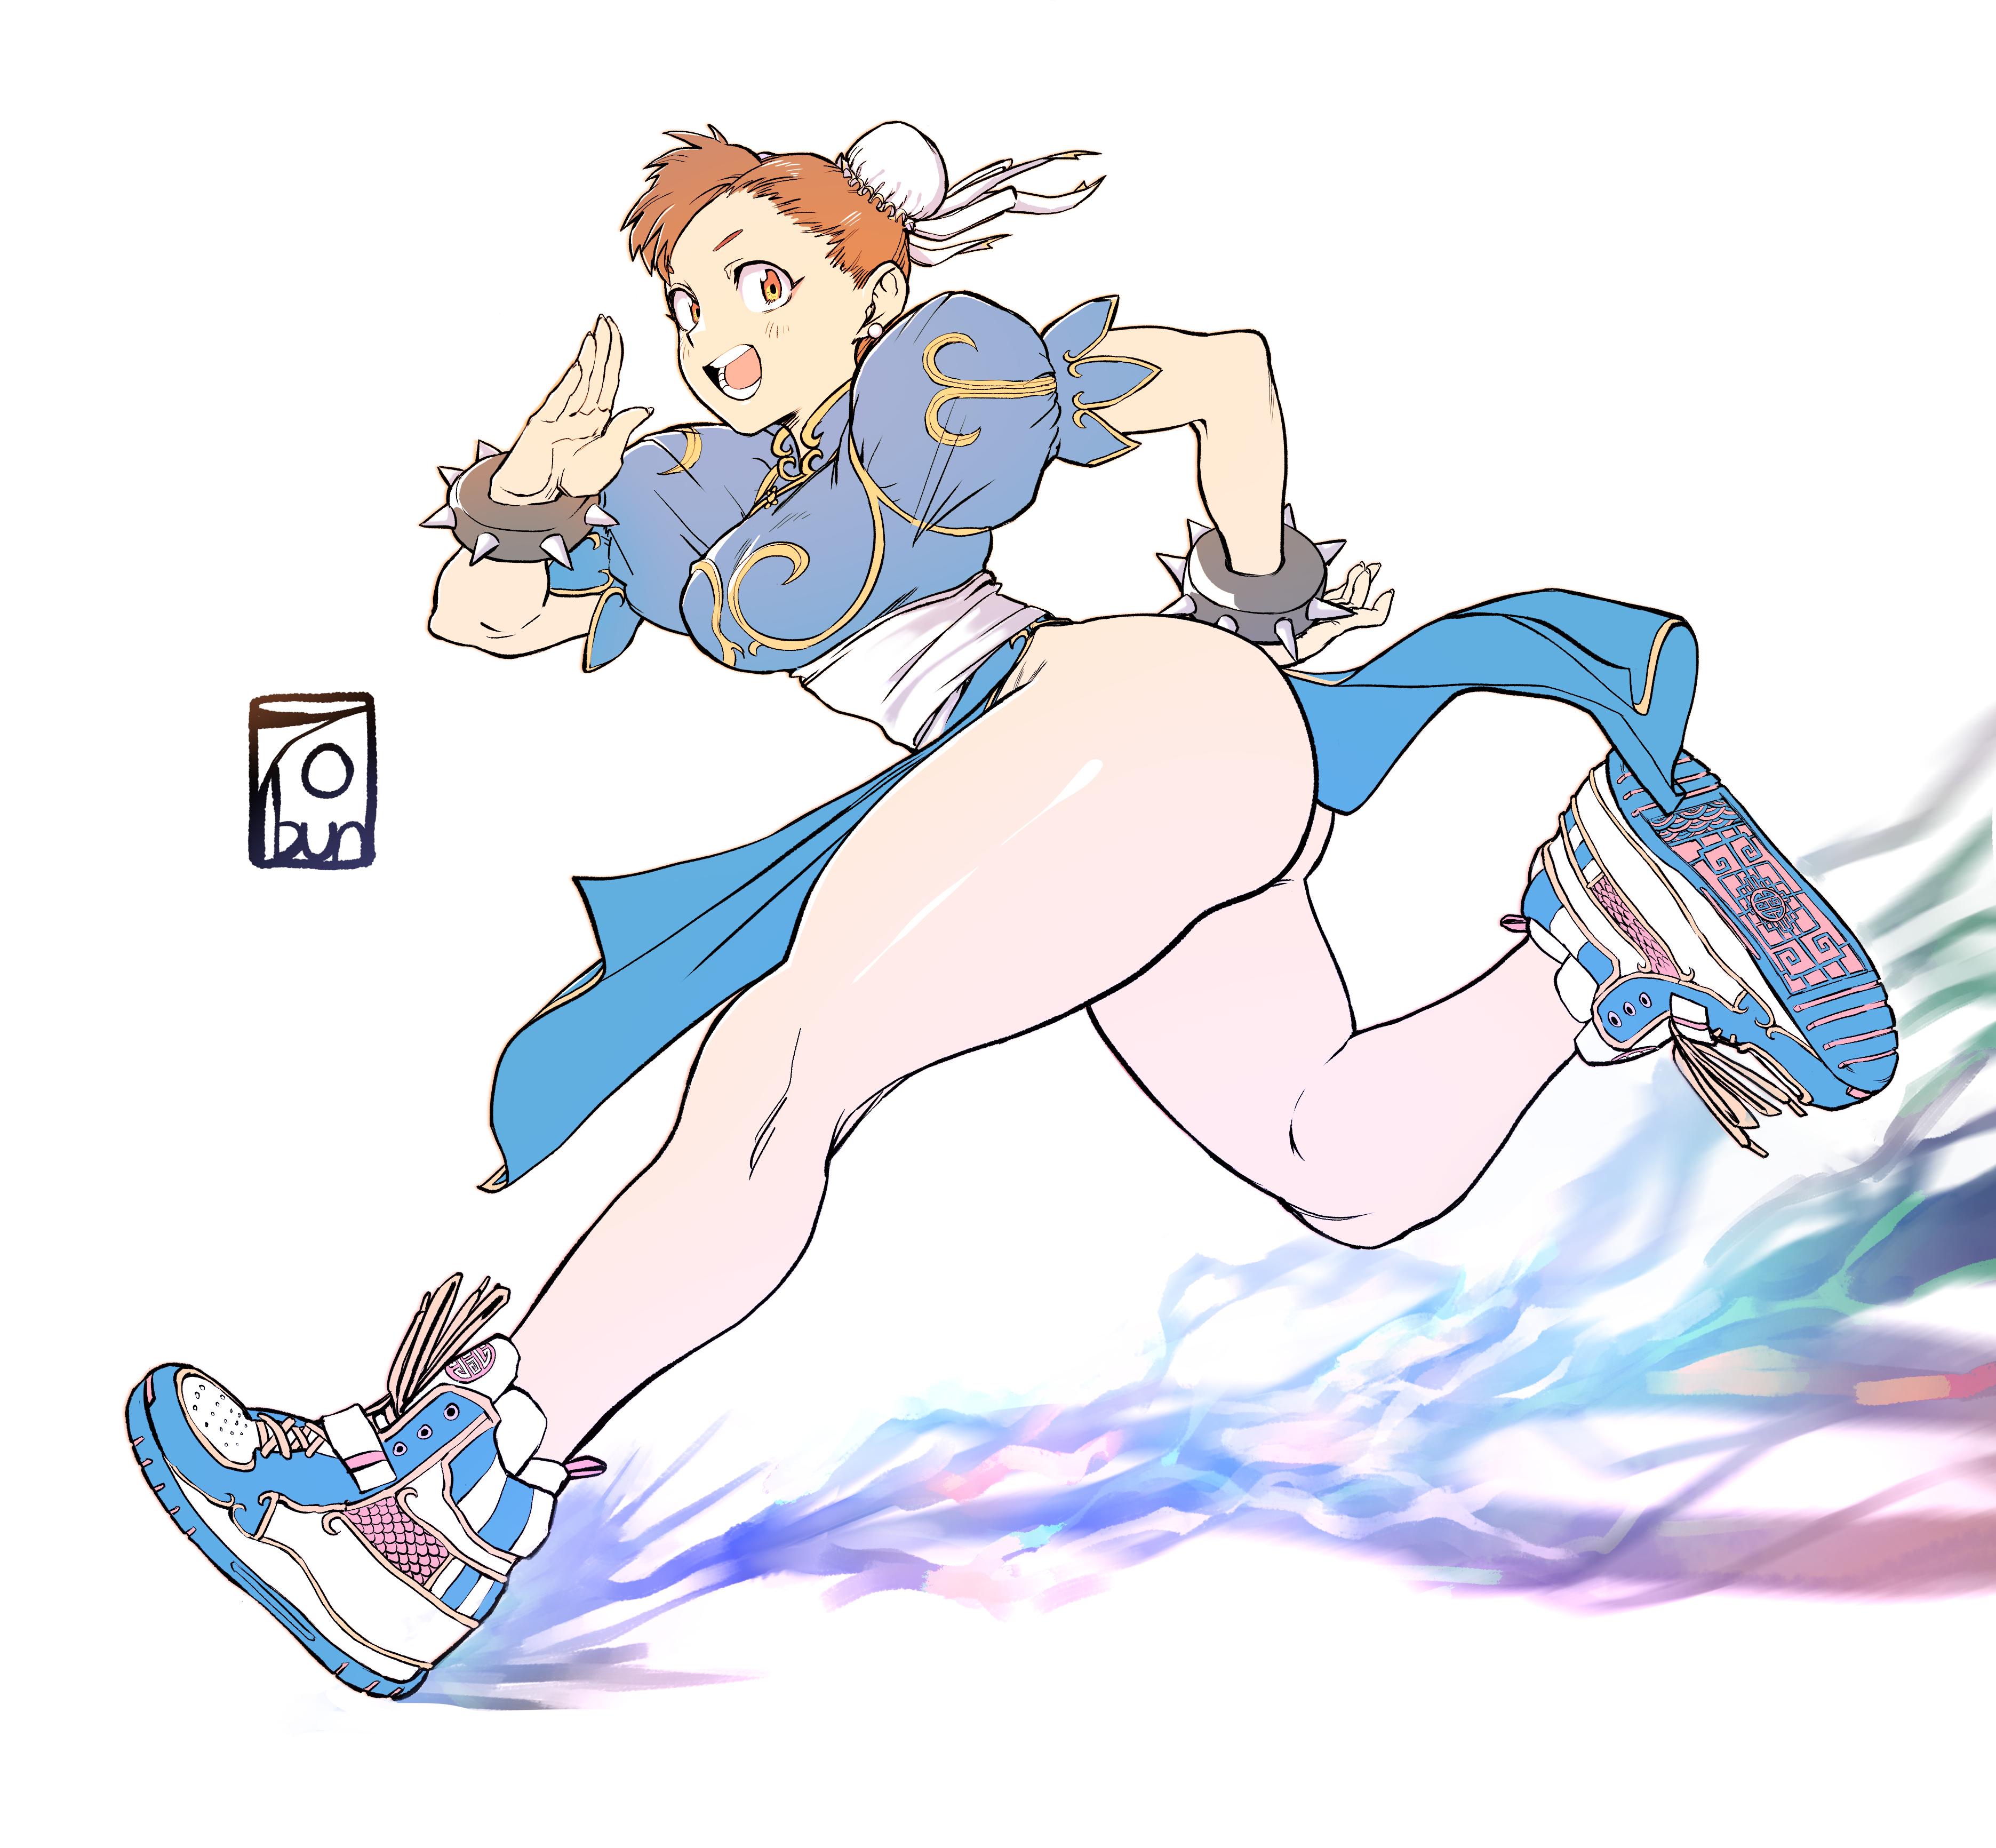 Chun-Li with big shoes